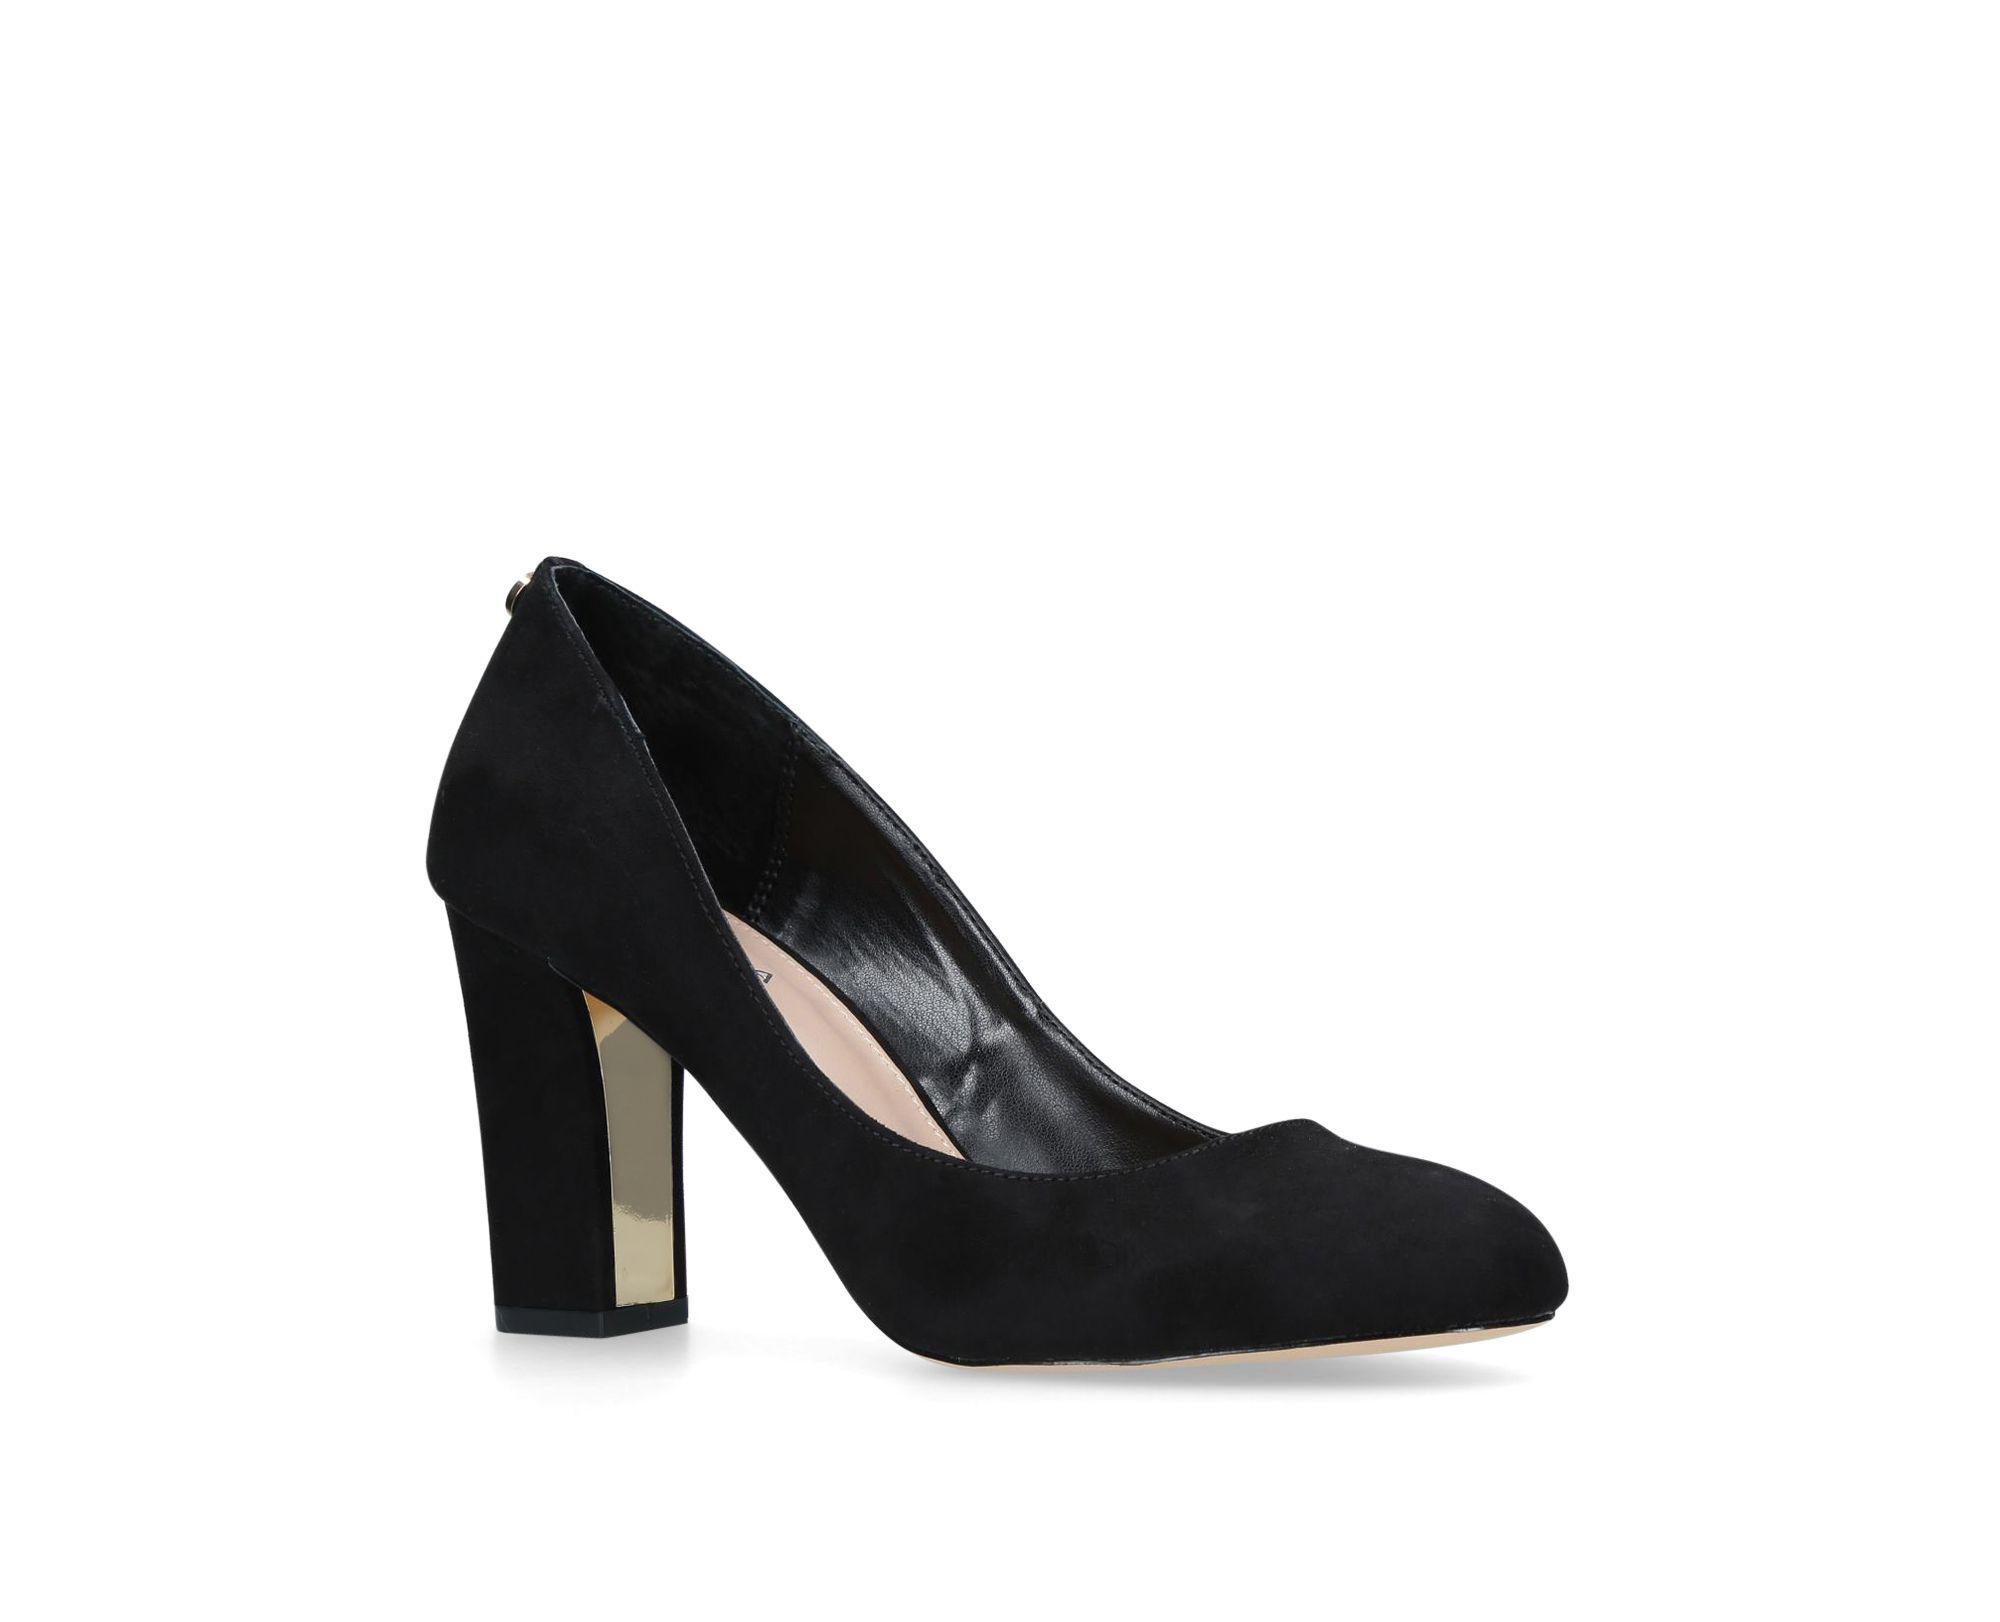 2d61adea6b23 Carvela Kurt Geiger Black  kruise  Mid Heel Court Shoes in Black ...